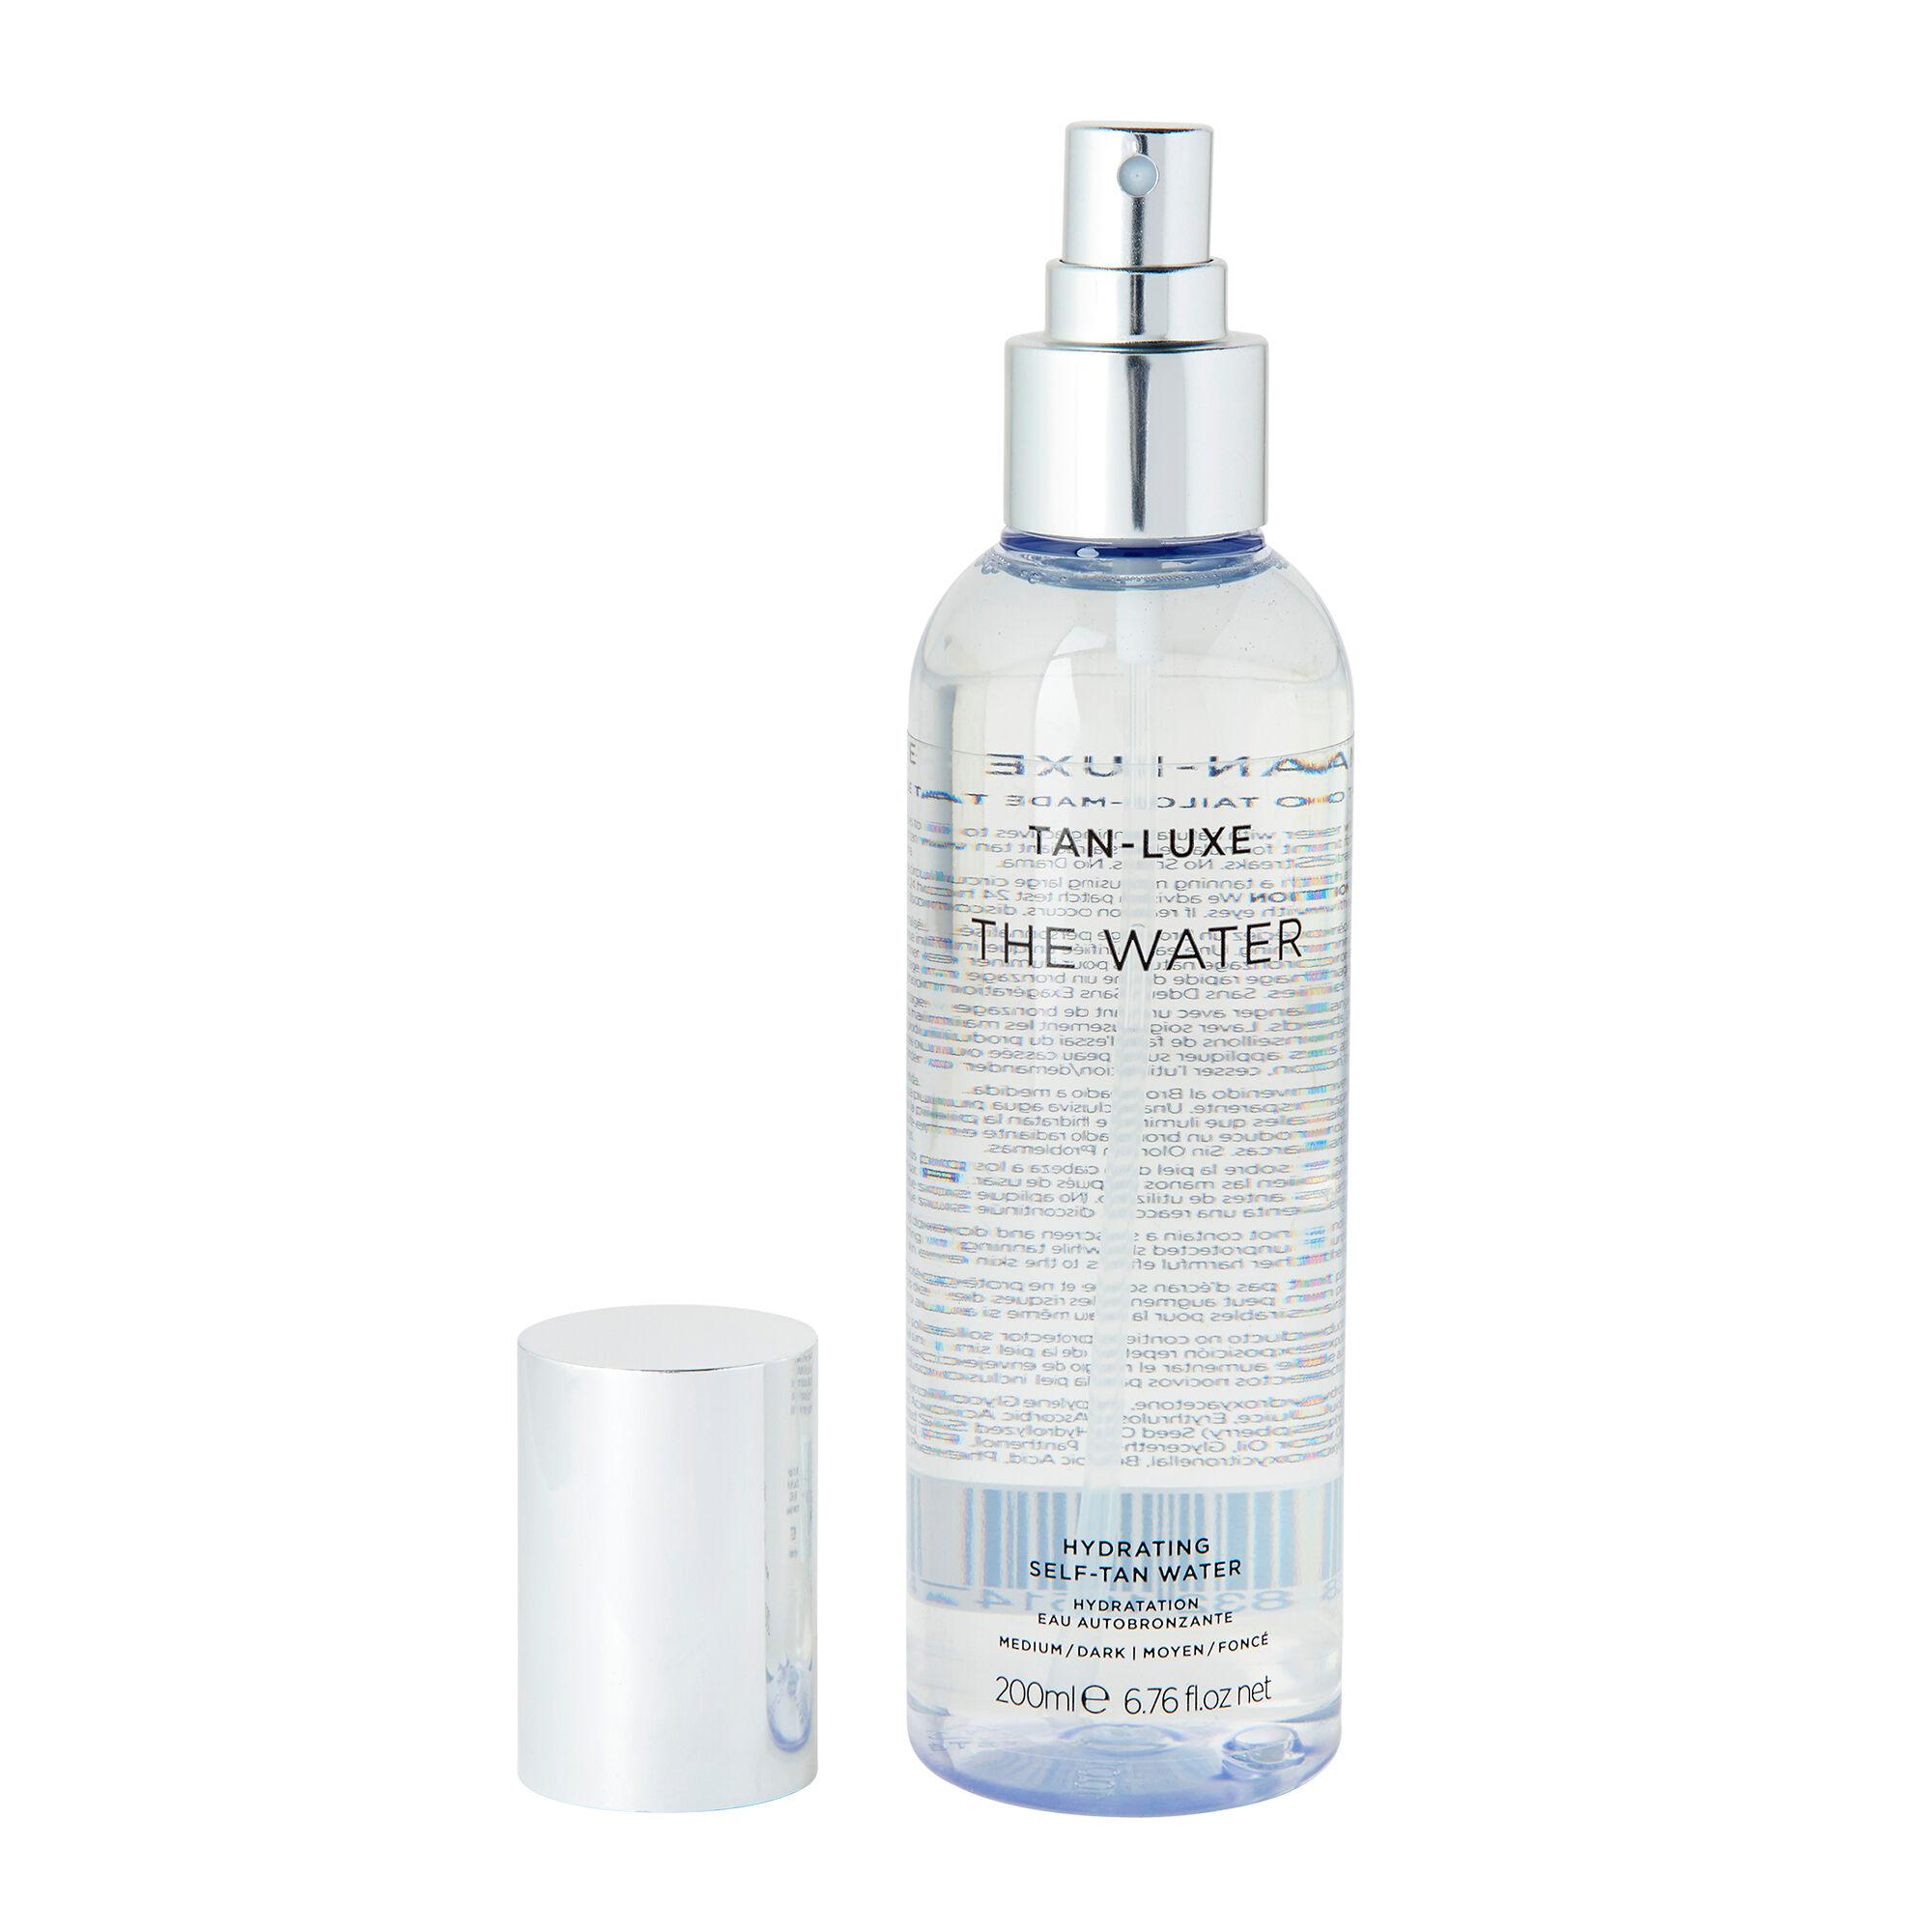 TAN-LUXE The WATER MediumDark 200ml